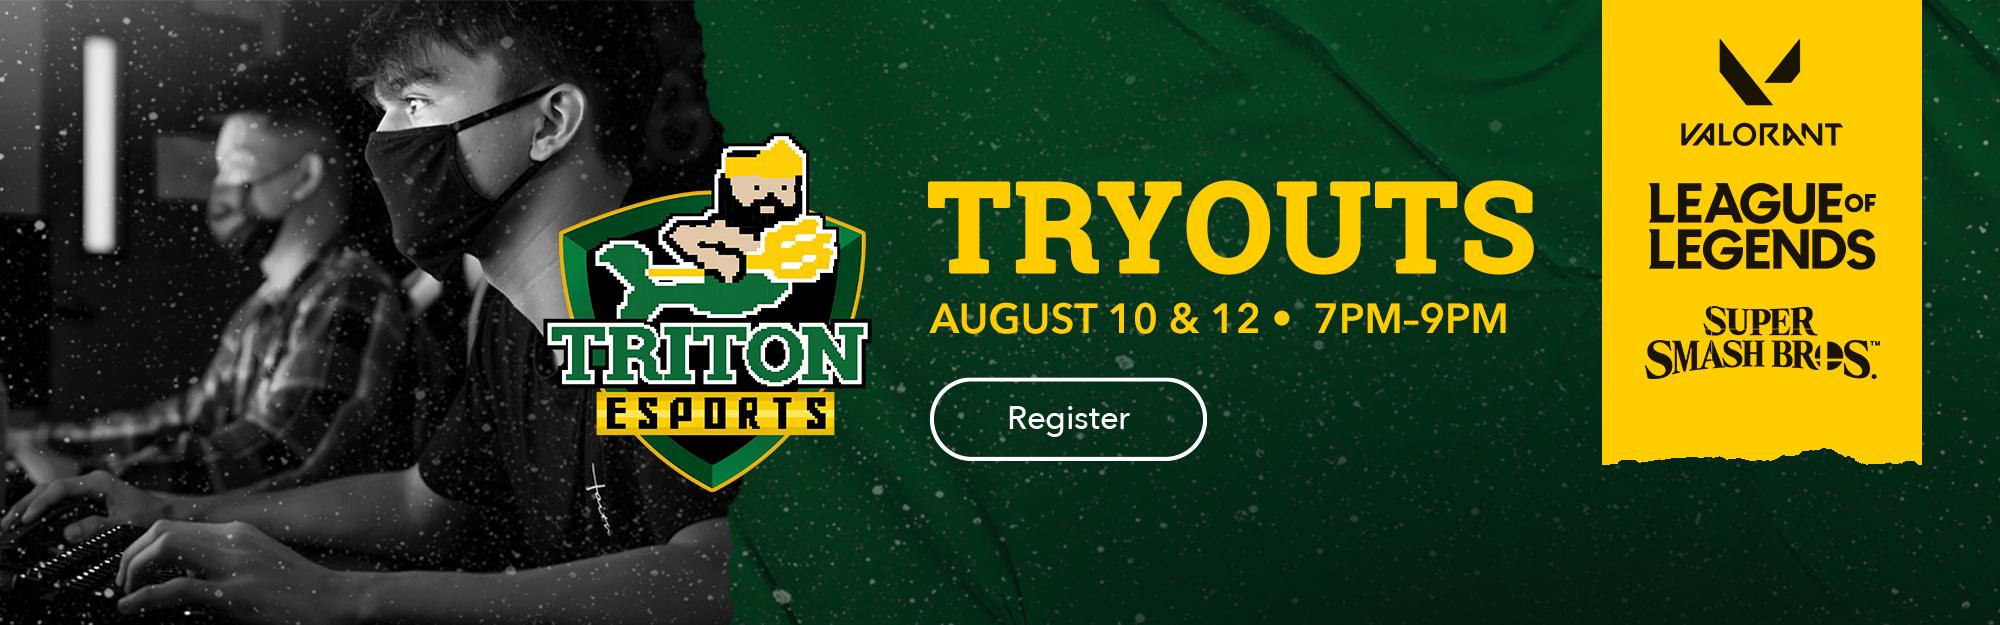 Triton Esports Tryouts